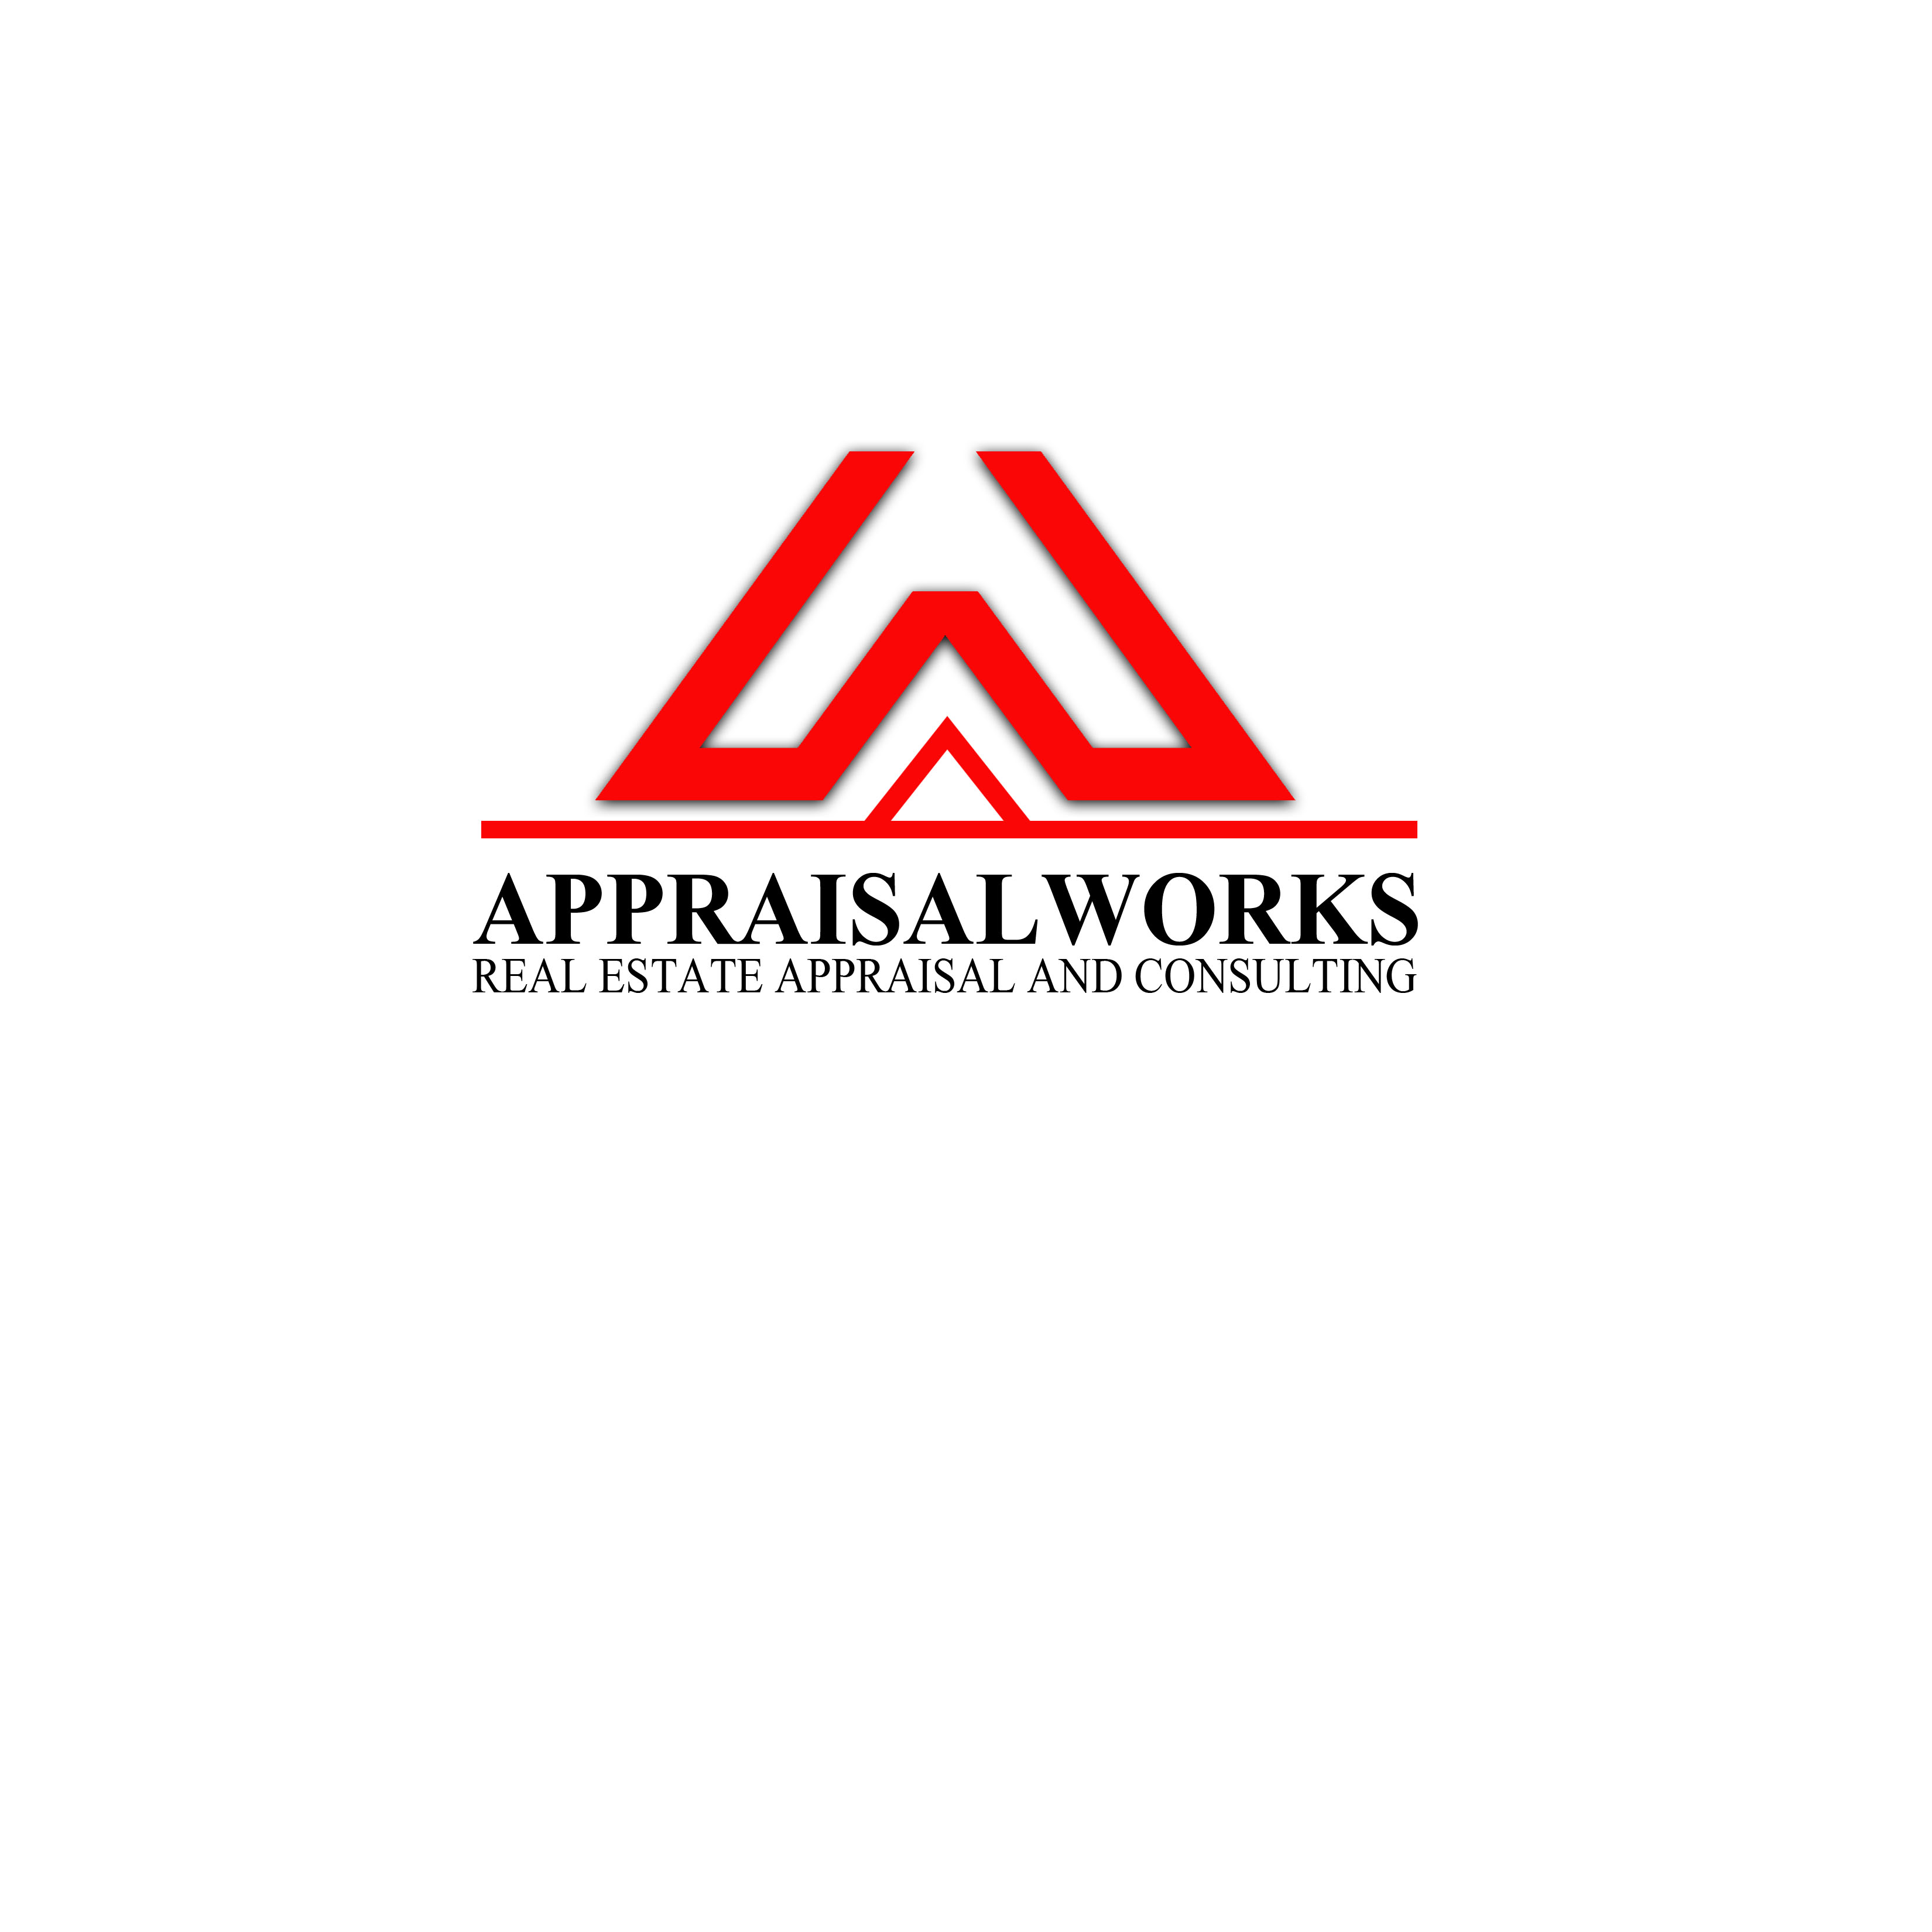 Logo Design by Allan Esclamado - Entry No. 136 in the Logo Design Contest Appraisal Works Logo Design.